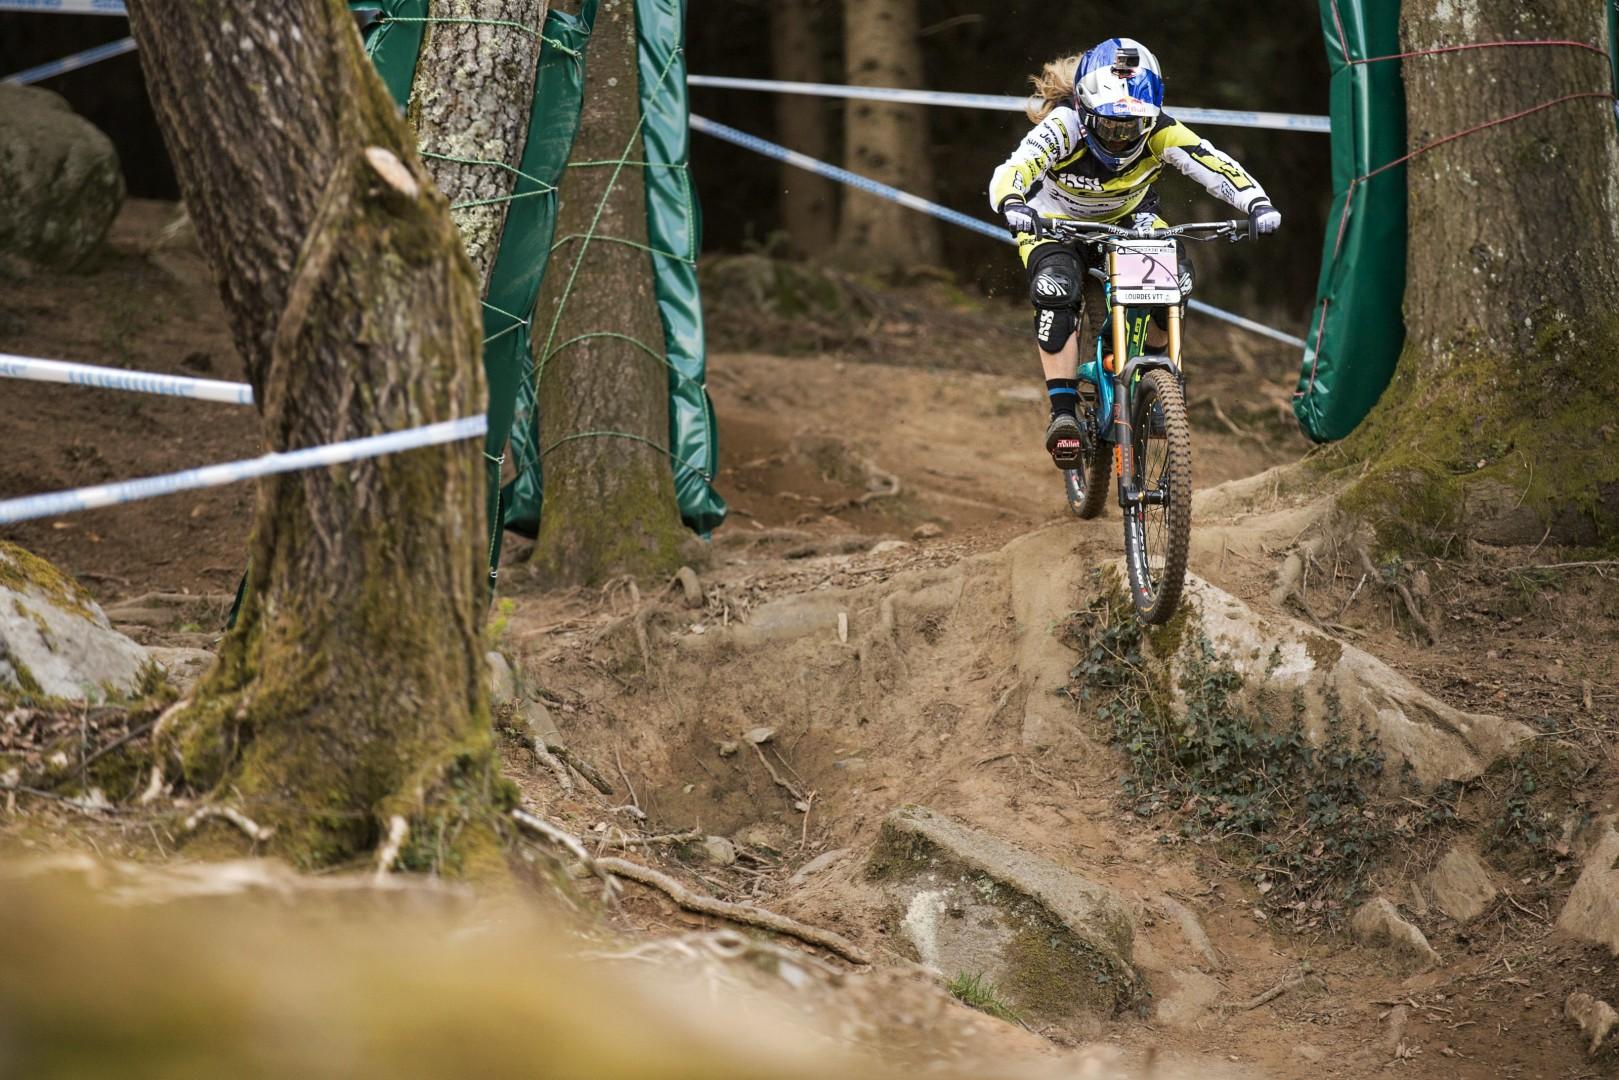 Rachel Atherton MTB UCI Lourdes 2015, fot. Lukas Pilz Red Bull Content Pool